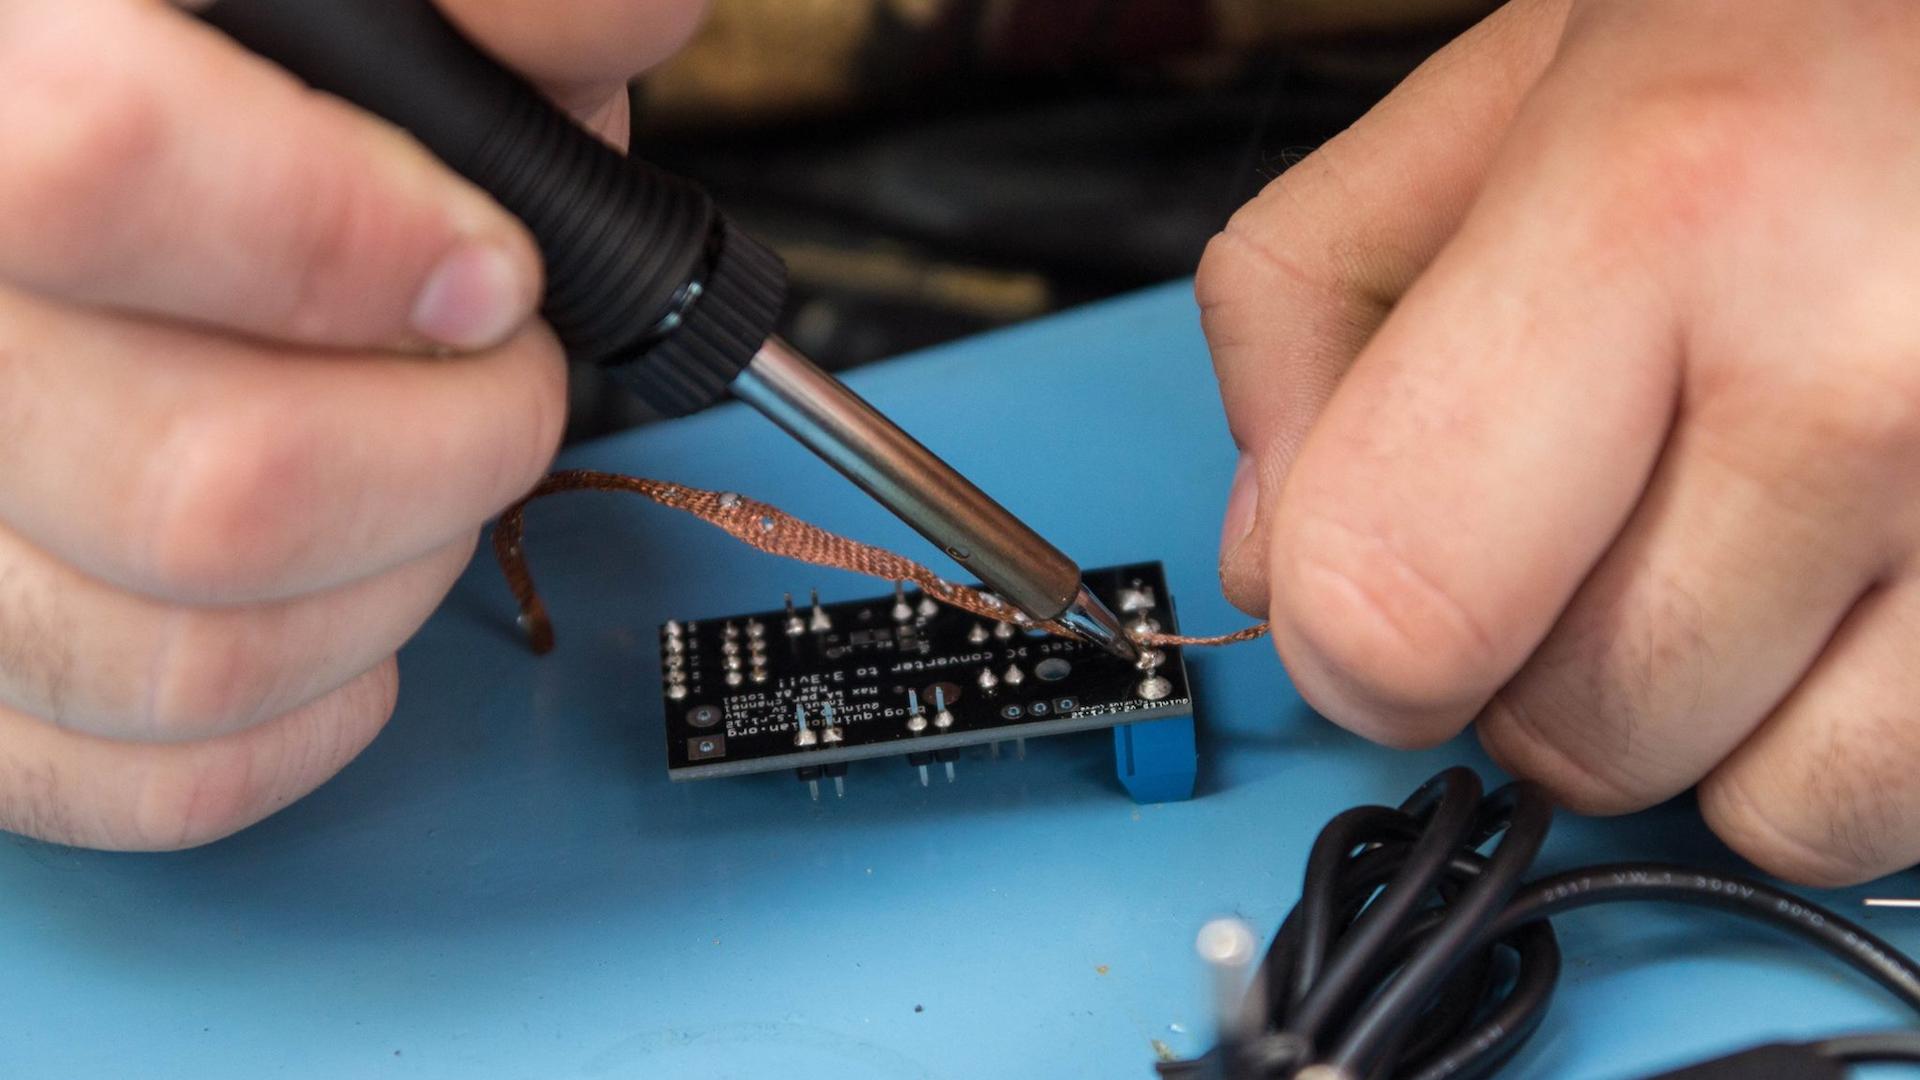 Tinkering: SMD Solderen